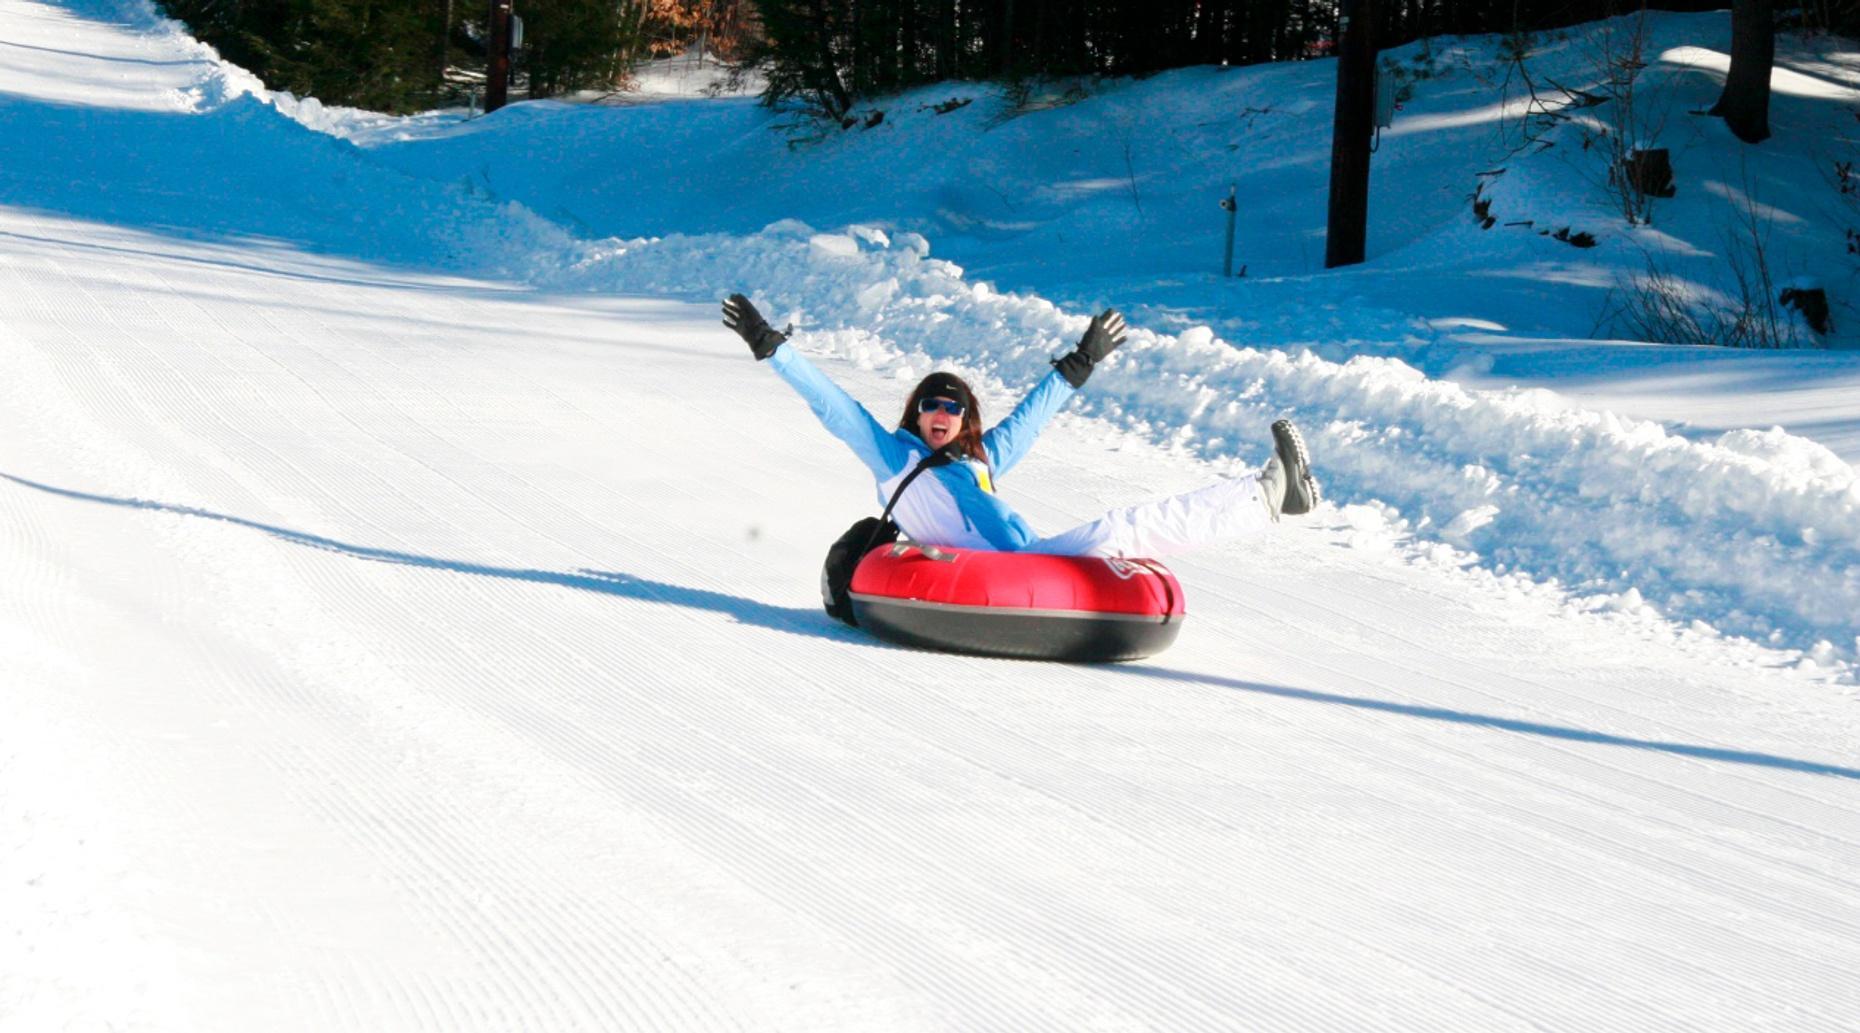 Friday Snowtubing Adventure in East Stroudsburg